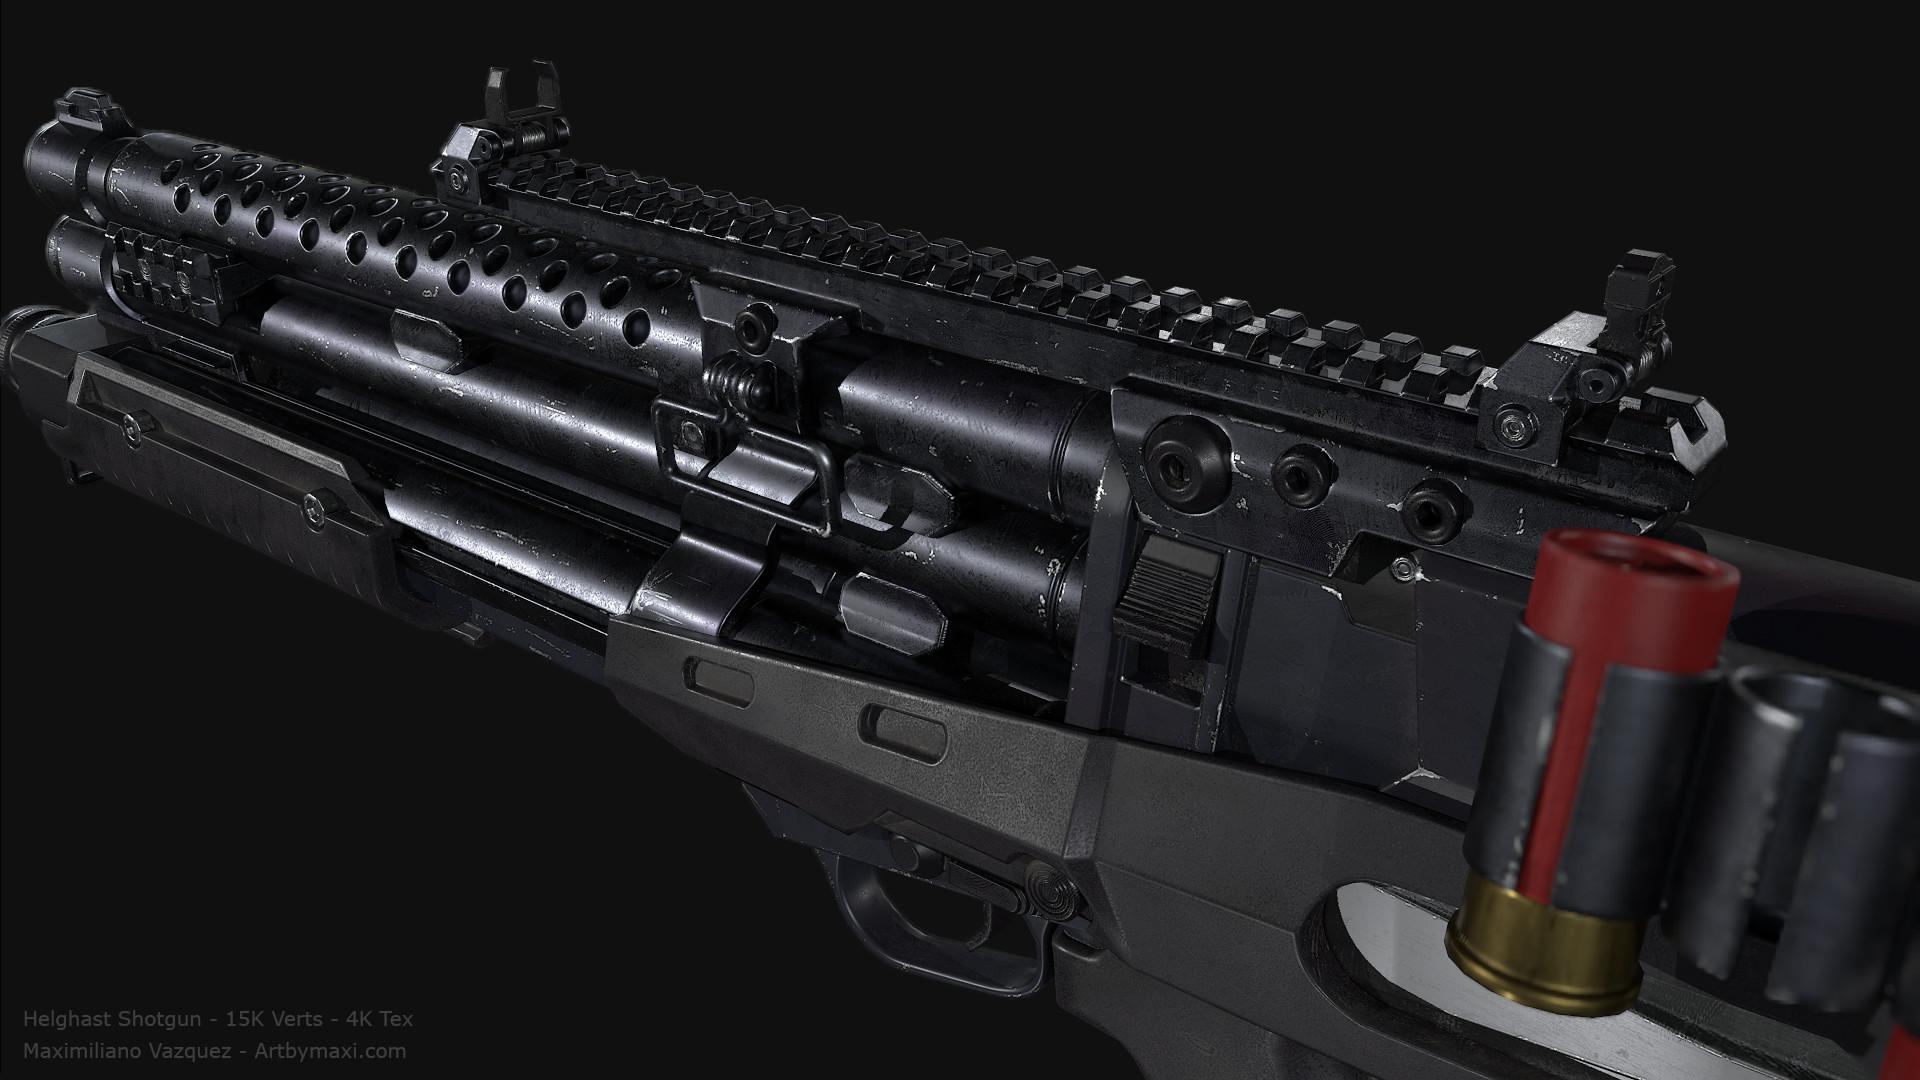 Maximiliano vazquez hellghast shotgun lp4